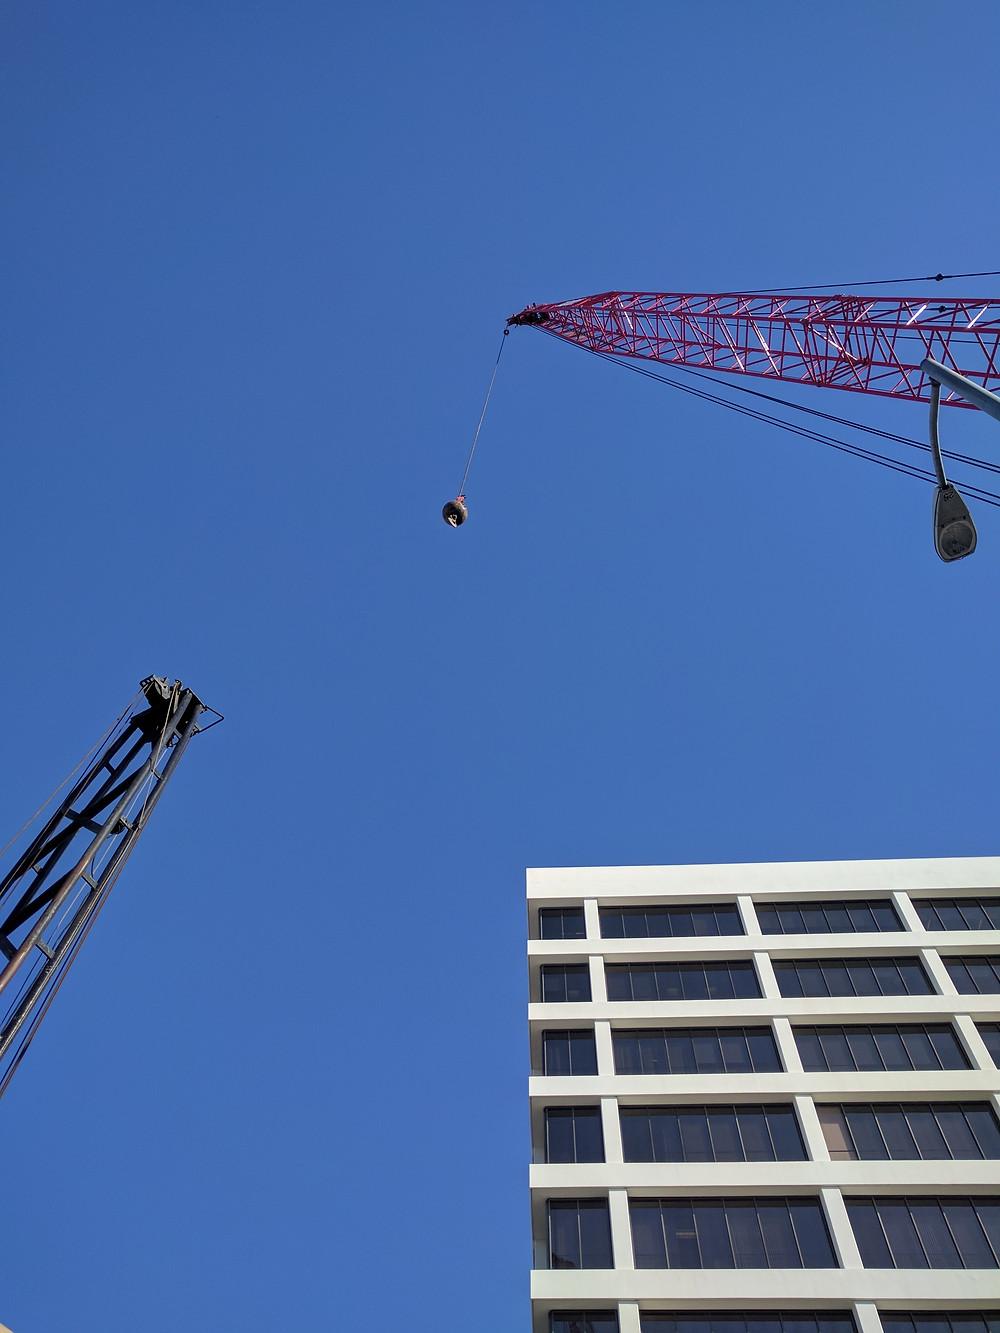 8383 Wilshire Blvd., Beverly Hills, CA 90212 Construction